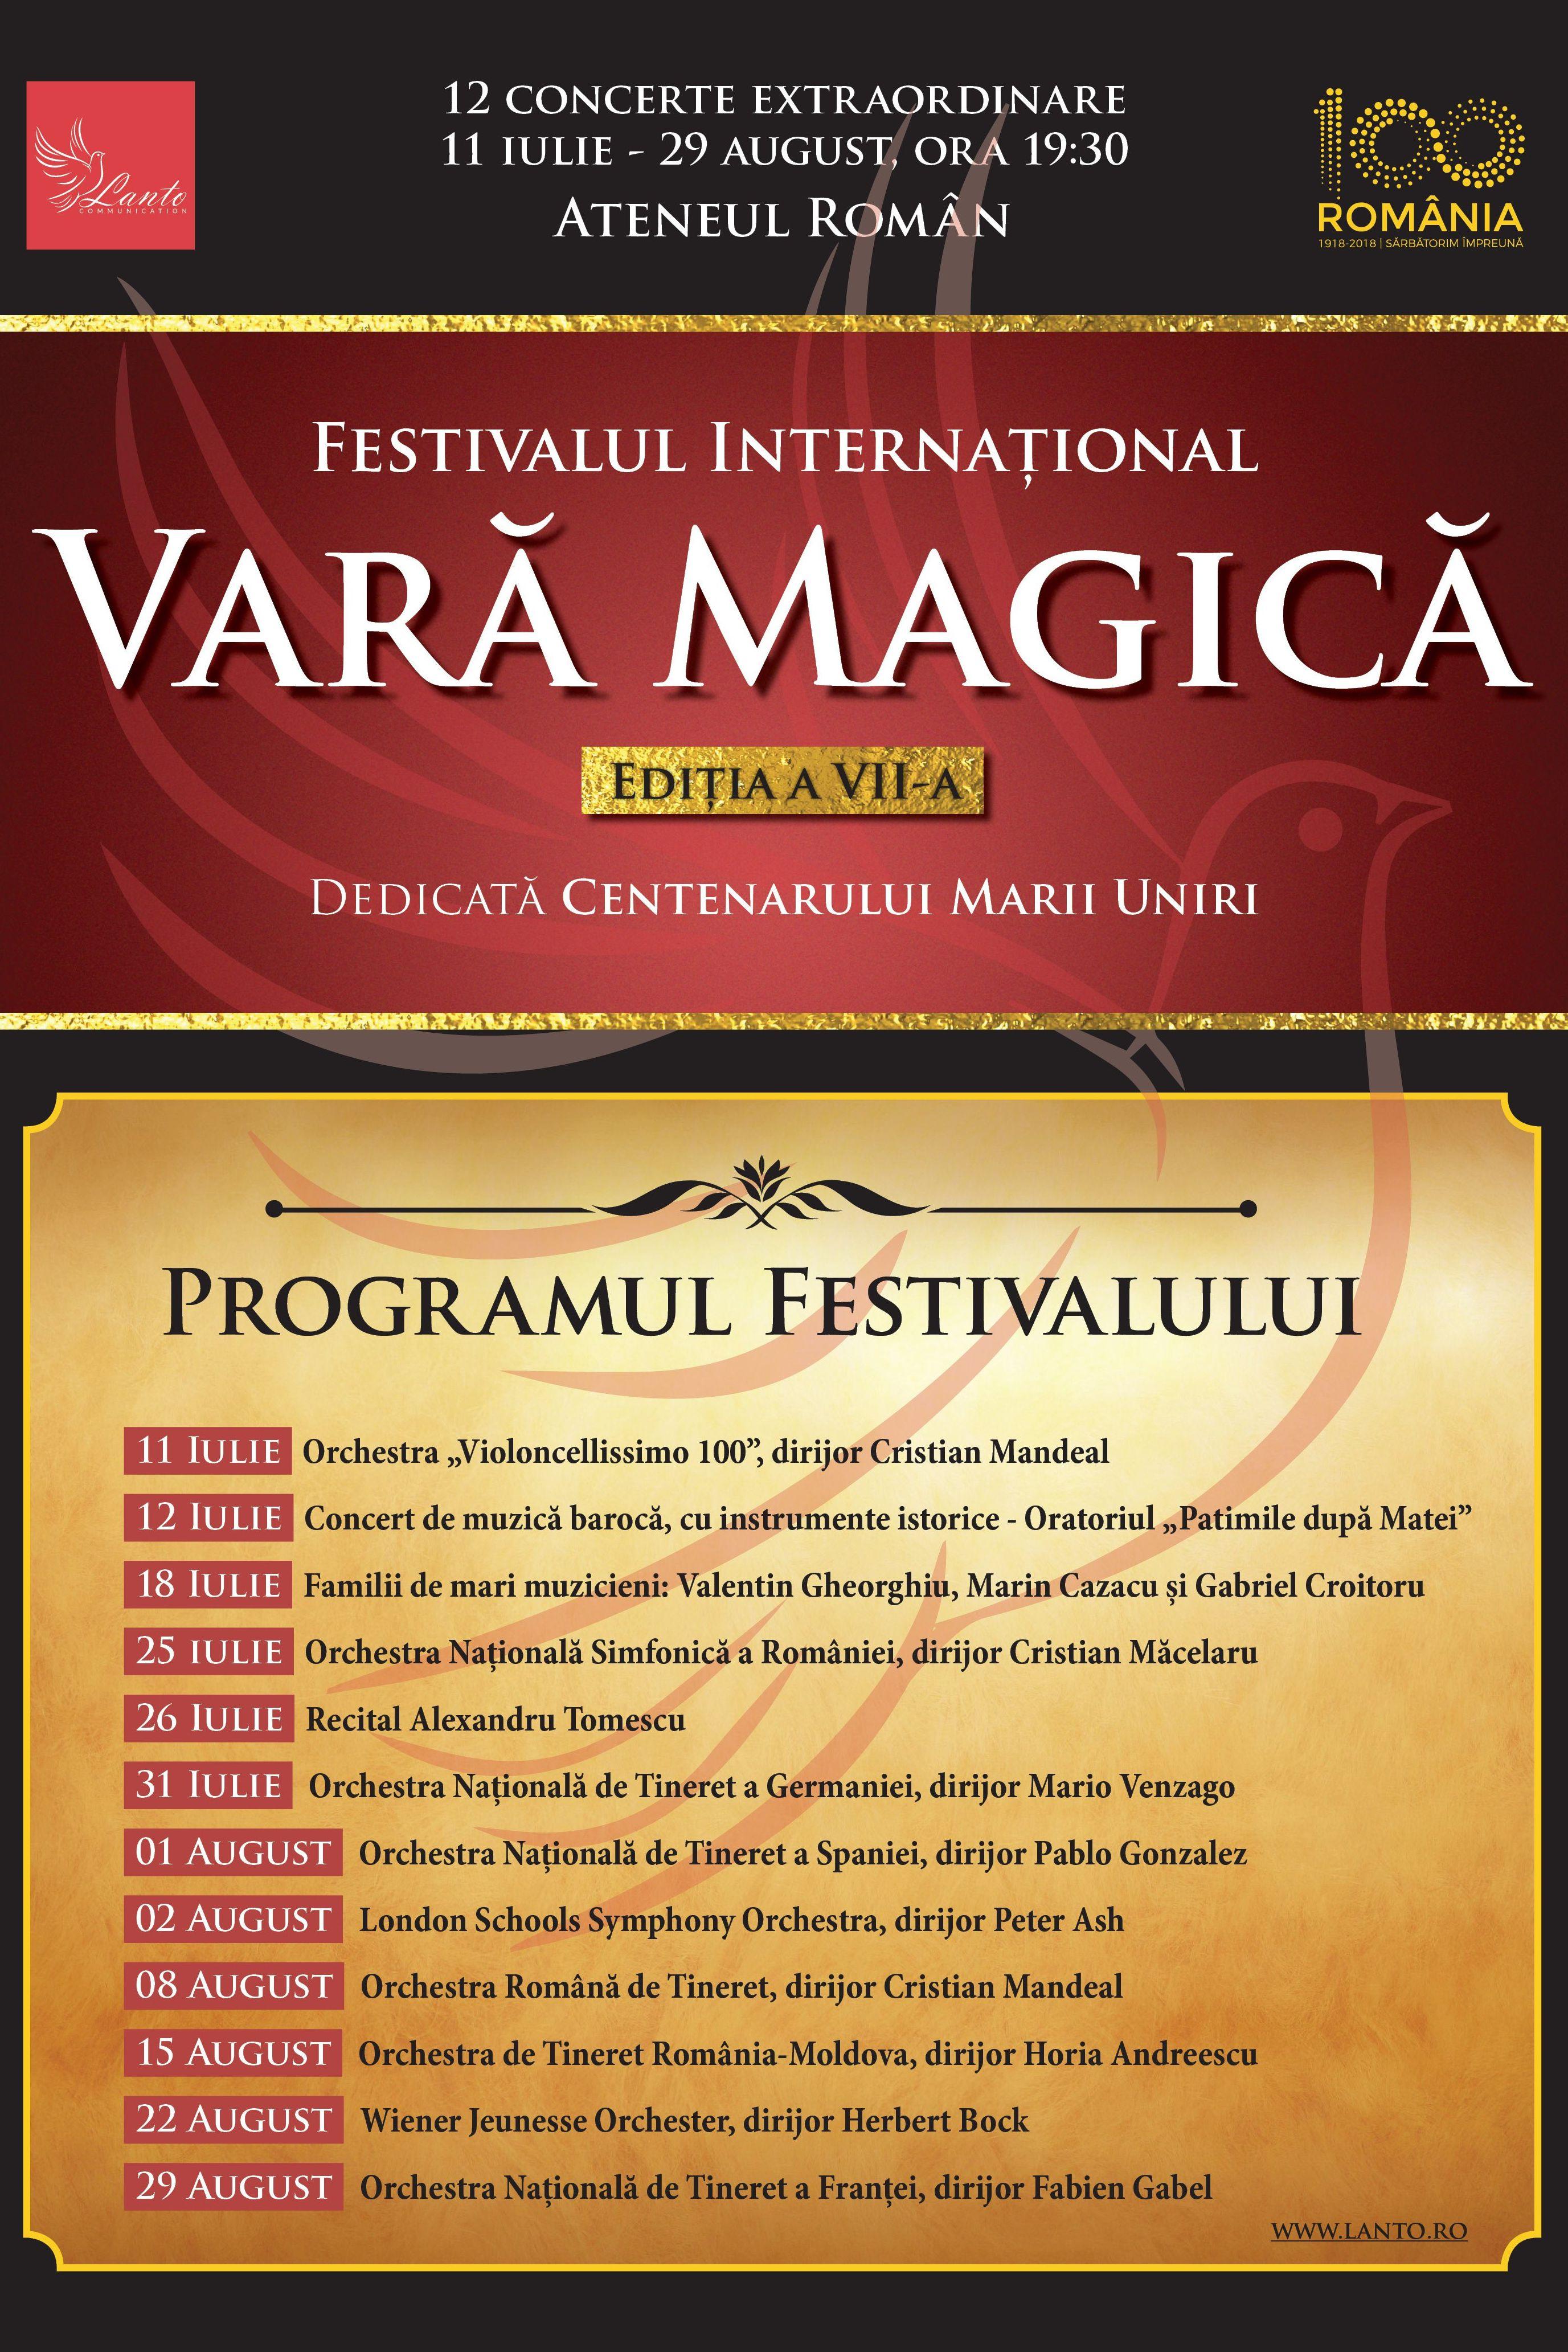 Festivalul Vara Magică 2018 la Ateneul Român